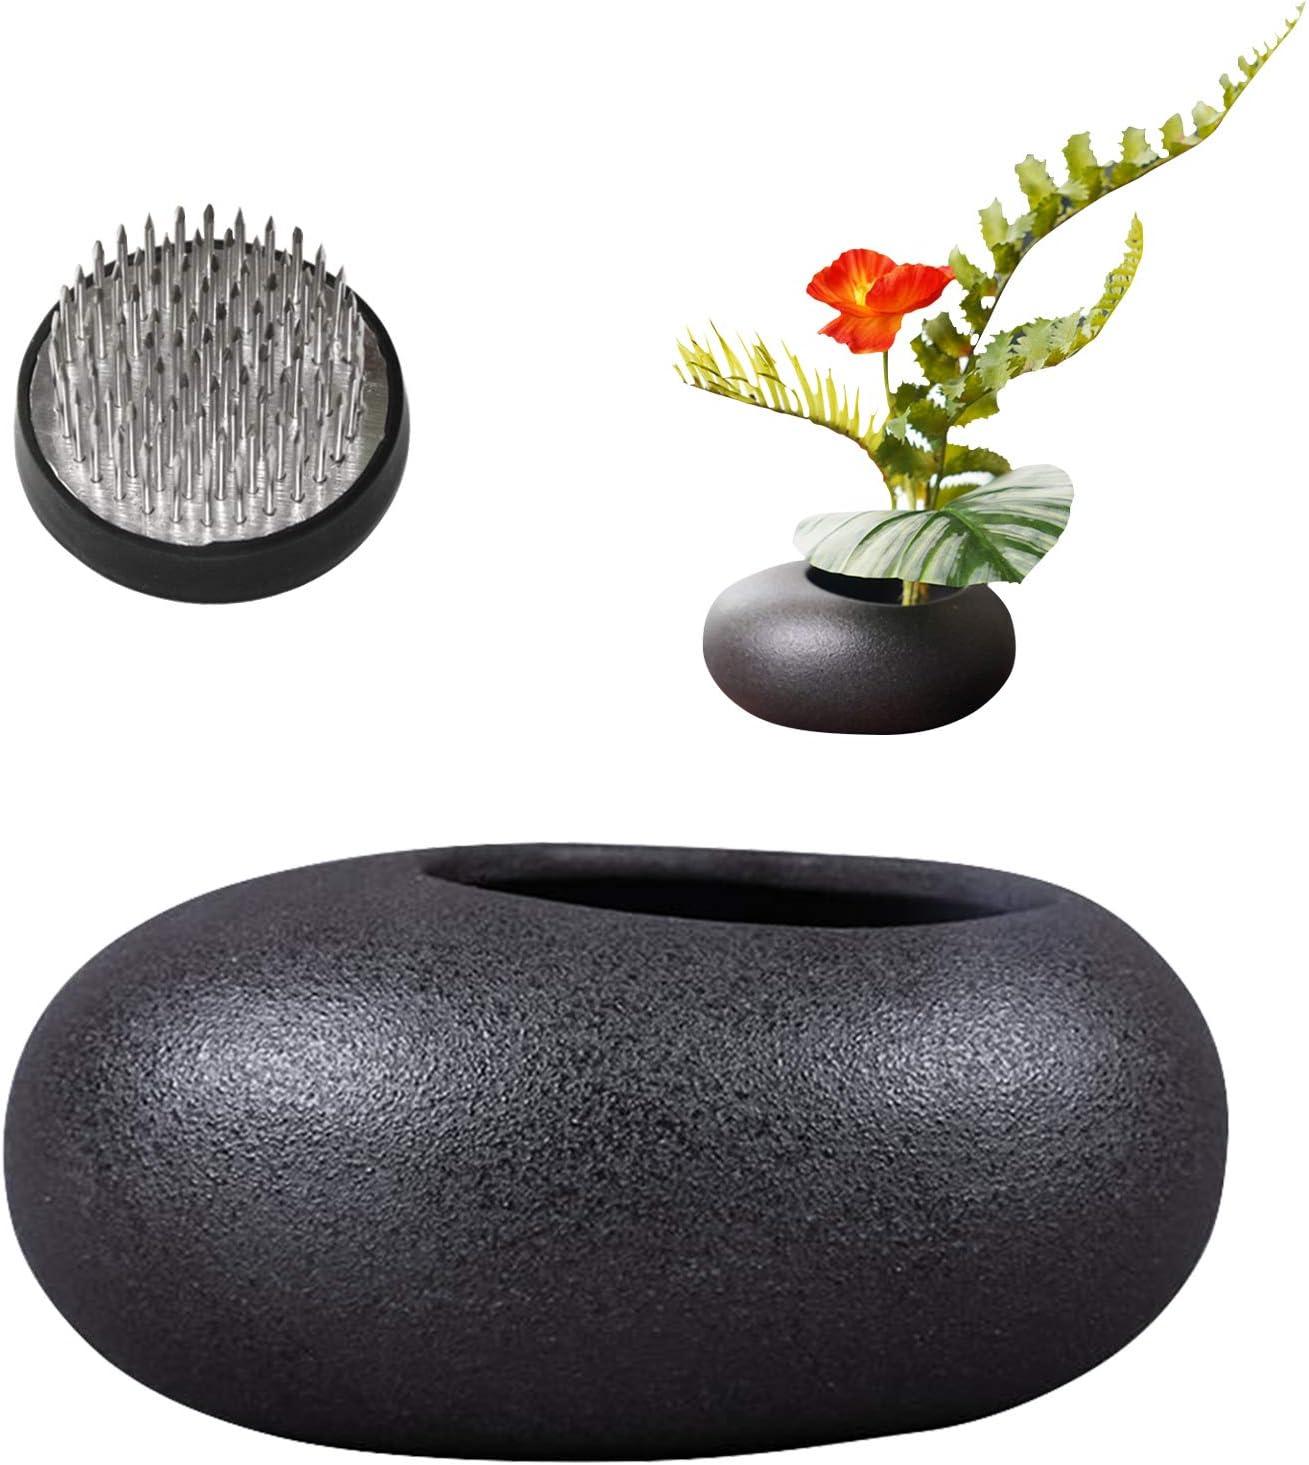 WANDIC Regular dealer Flower Arrangement Ranking TOP16 Kit Black Ceramic Pebble Pot Planter